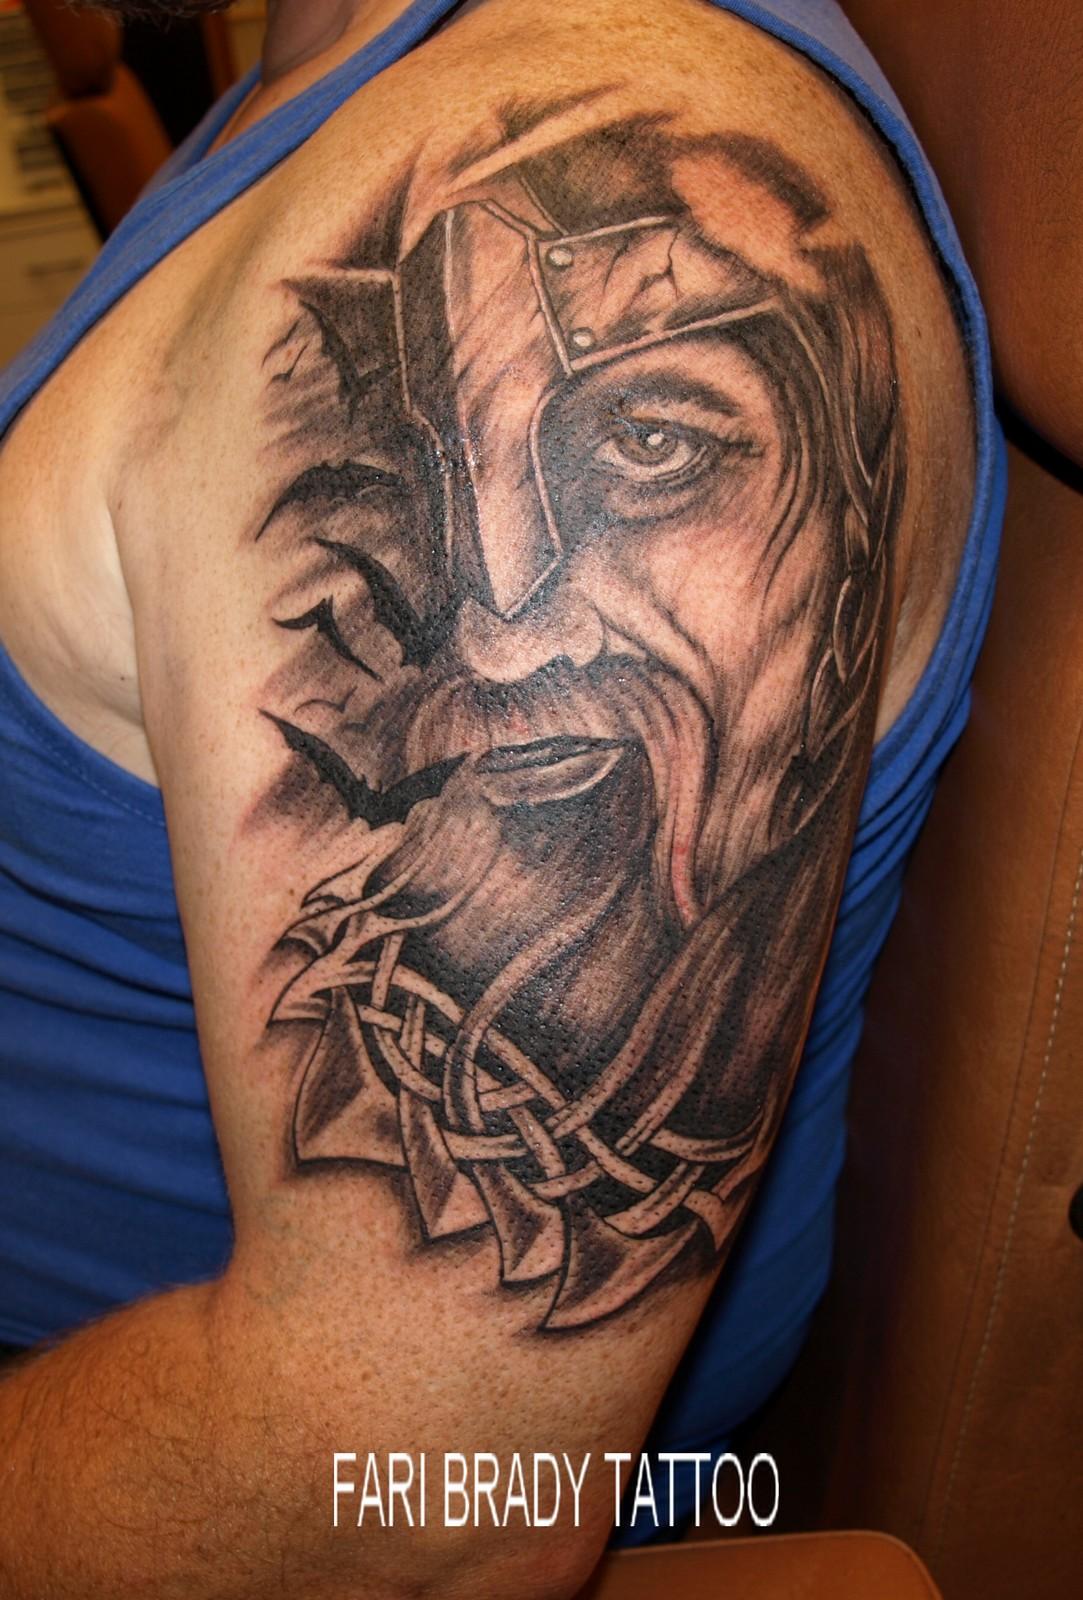 28 shading tattoo fari brady tattoo amp body piercing shading tattoo fari brady tattoo. Black Bedroom Furniture Sets. Home Design Ideas